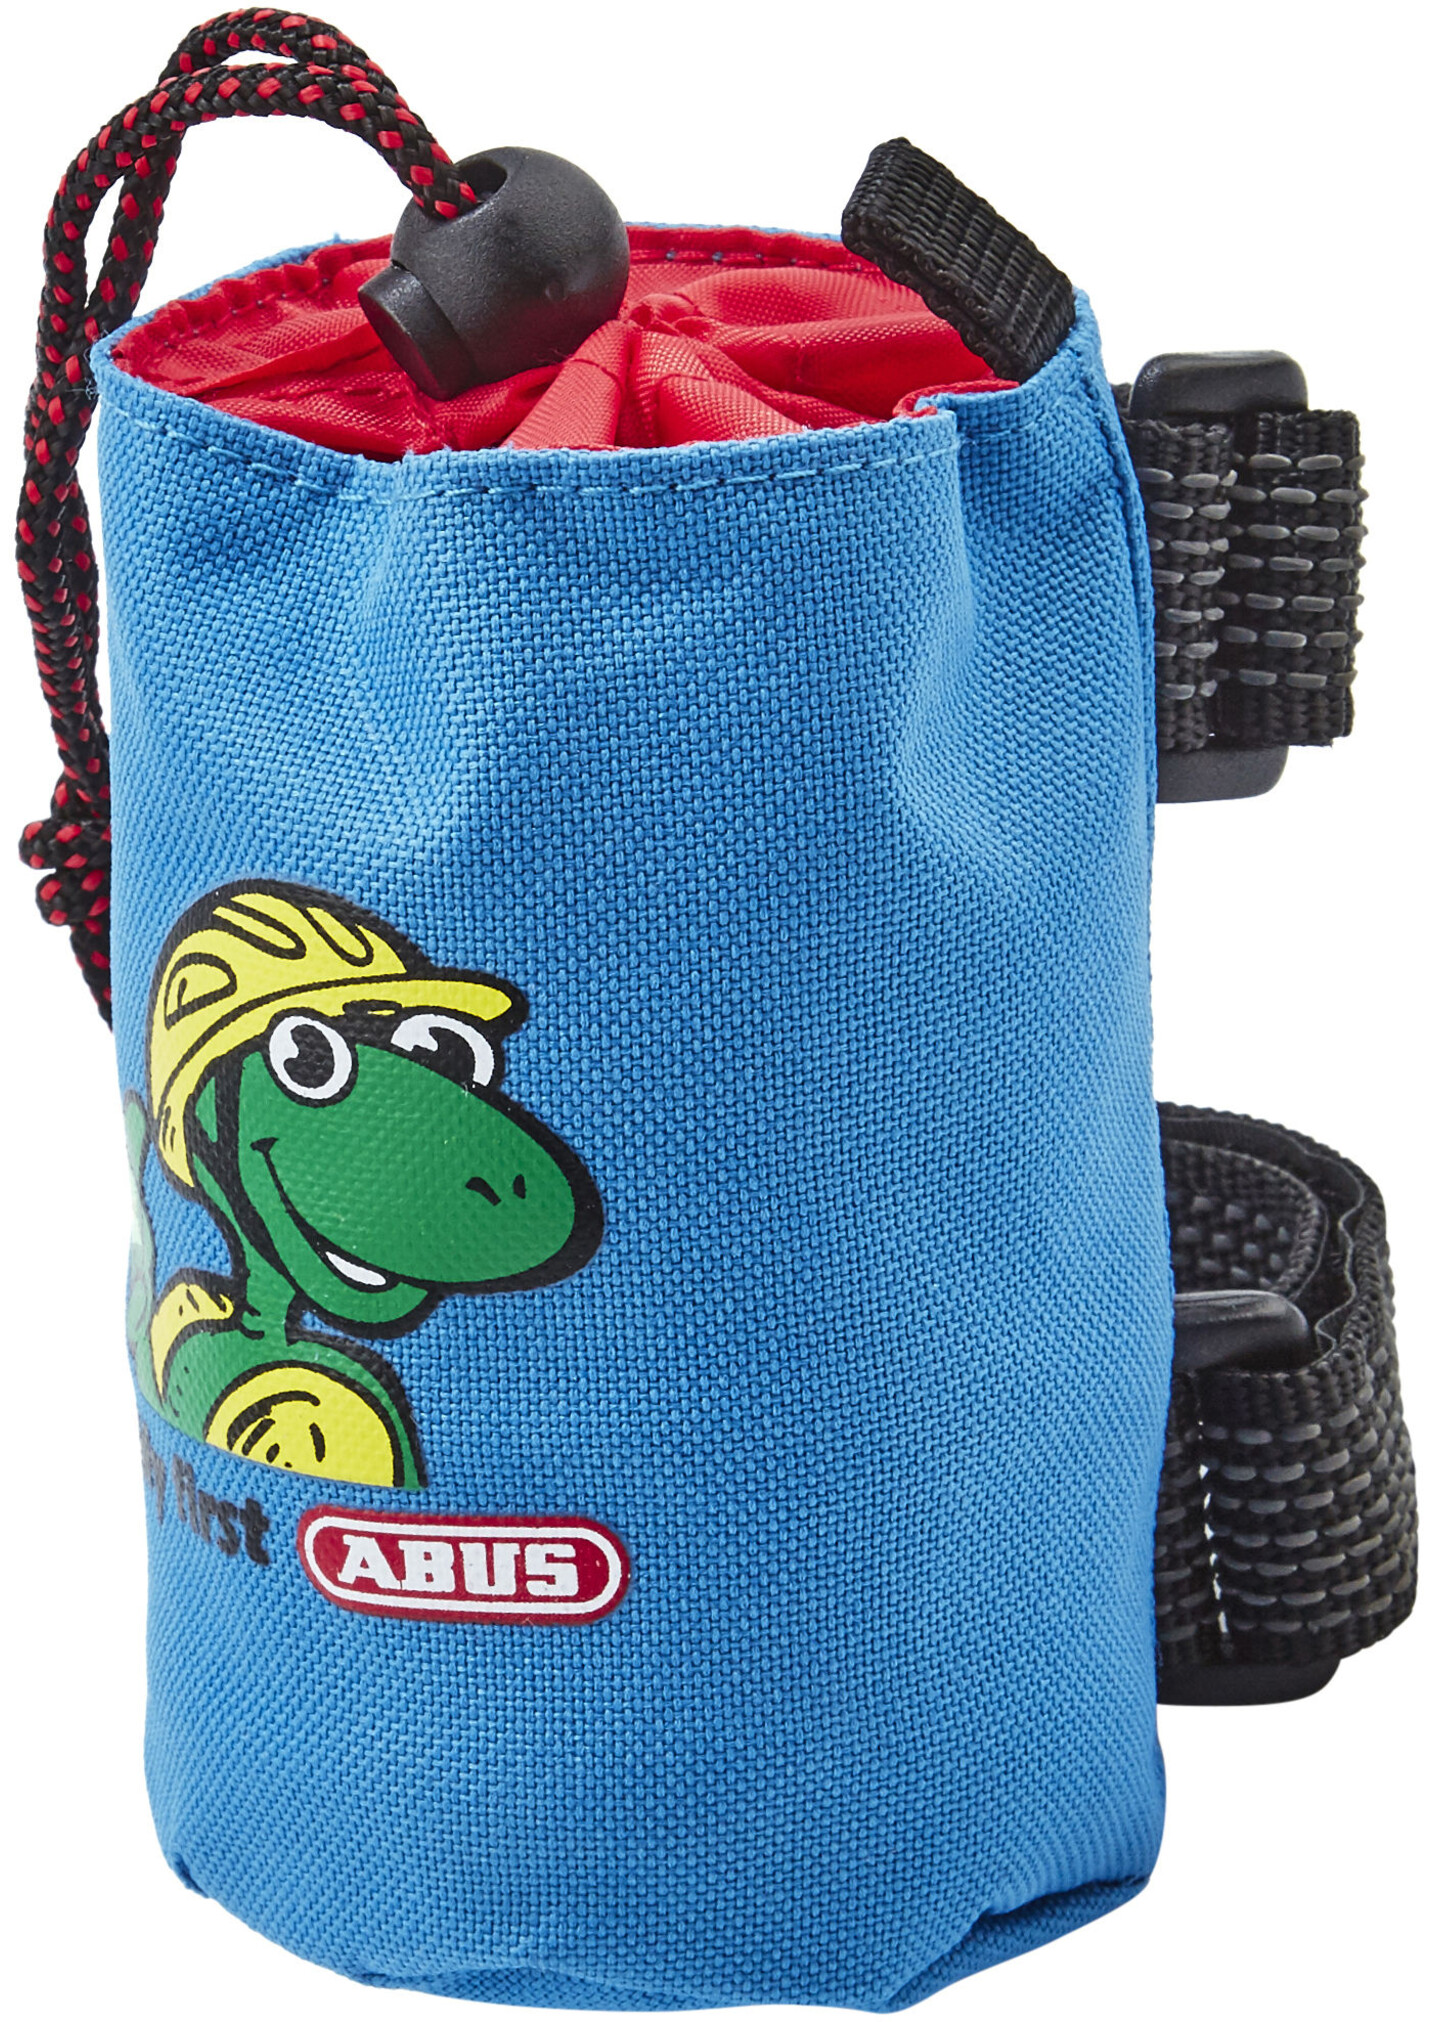 chrome backpack black friday b kategooria lubade hind